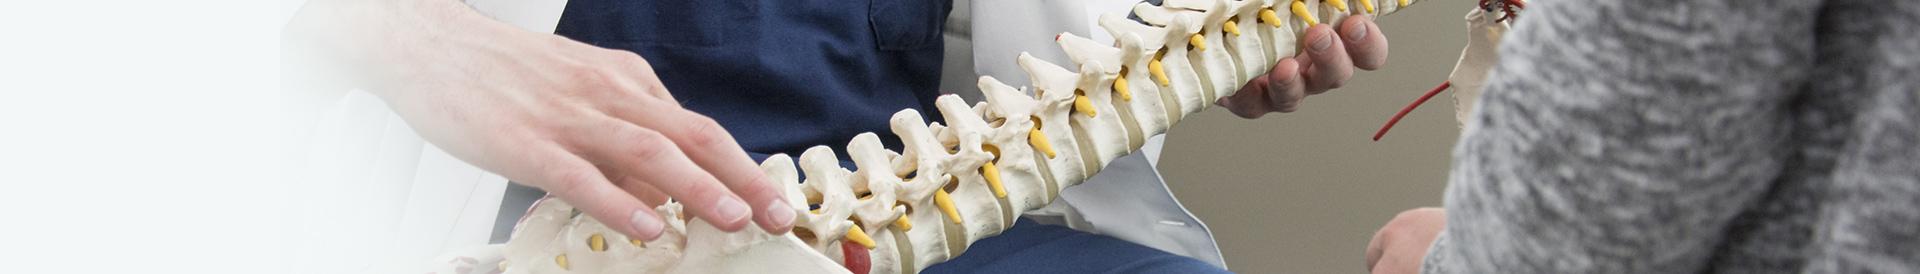 Minimally Invasive Spine Procedures